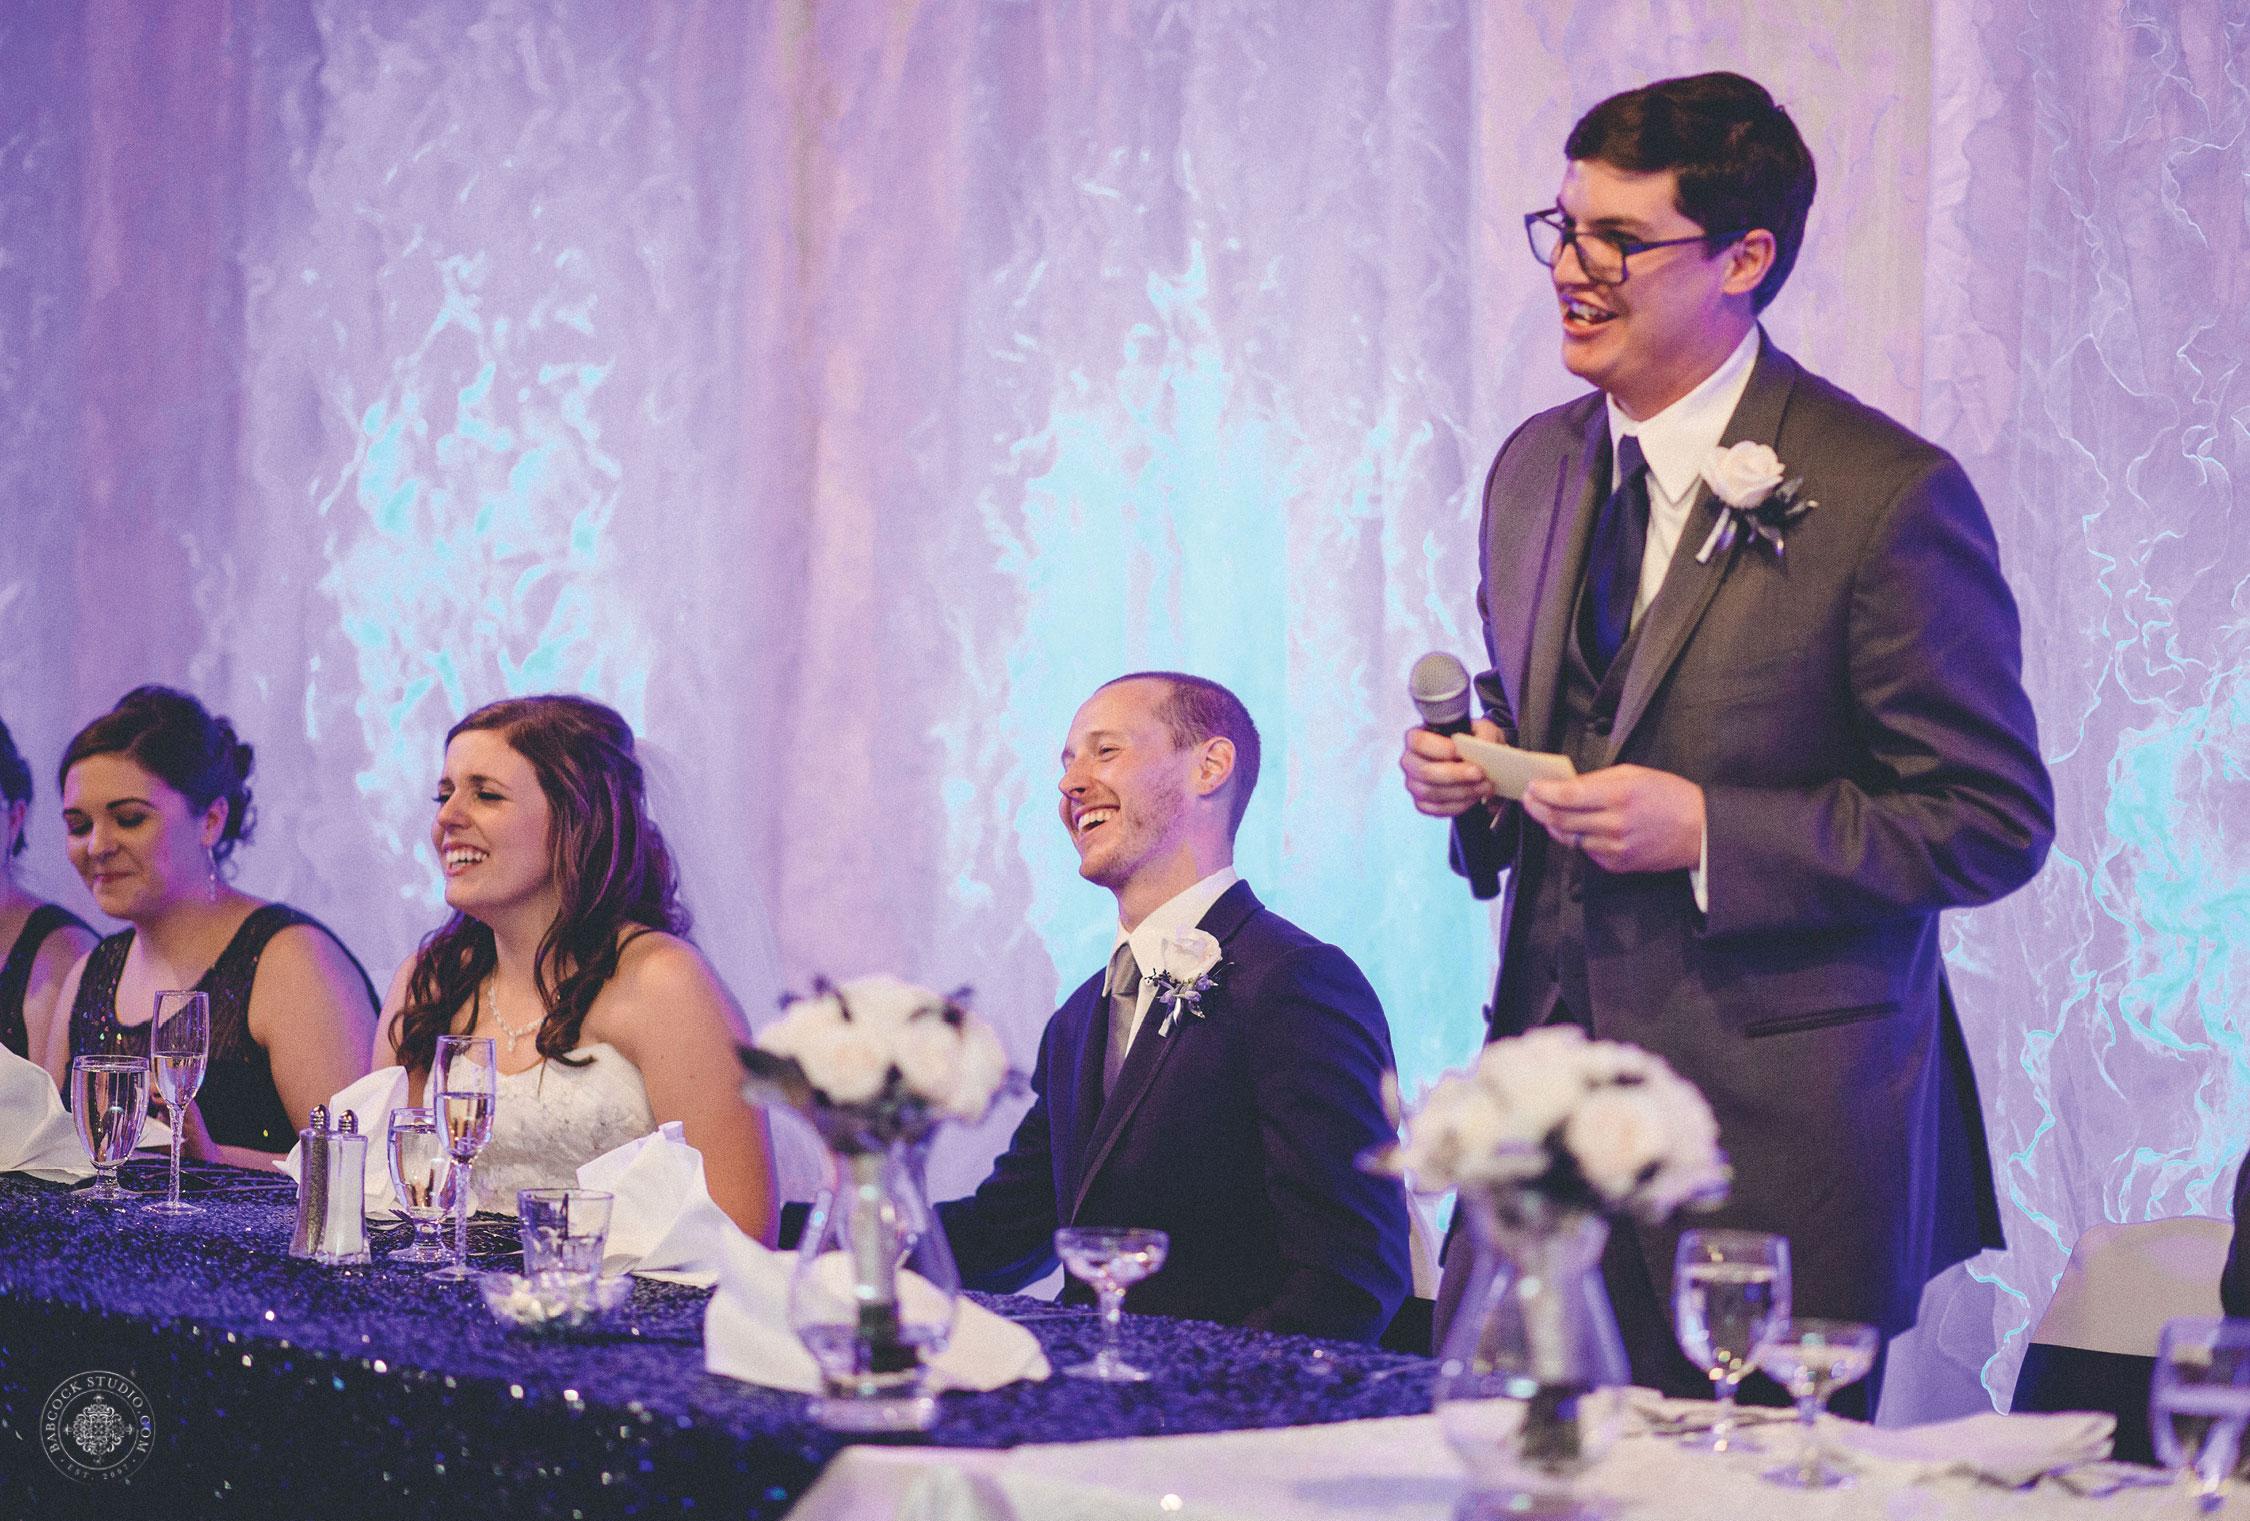 erica-nick-wedding-photographer-dayton-ohio-19.jpg